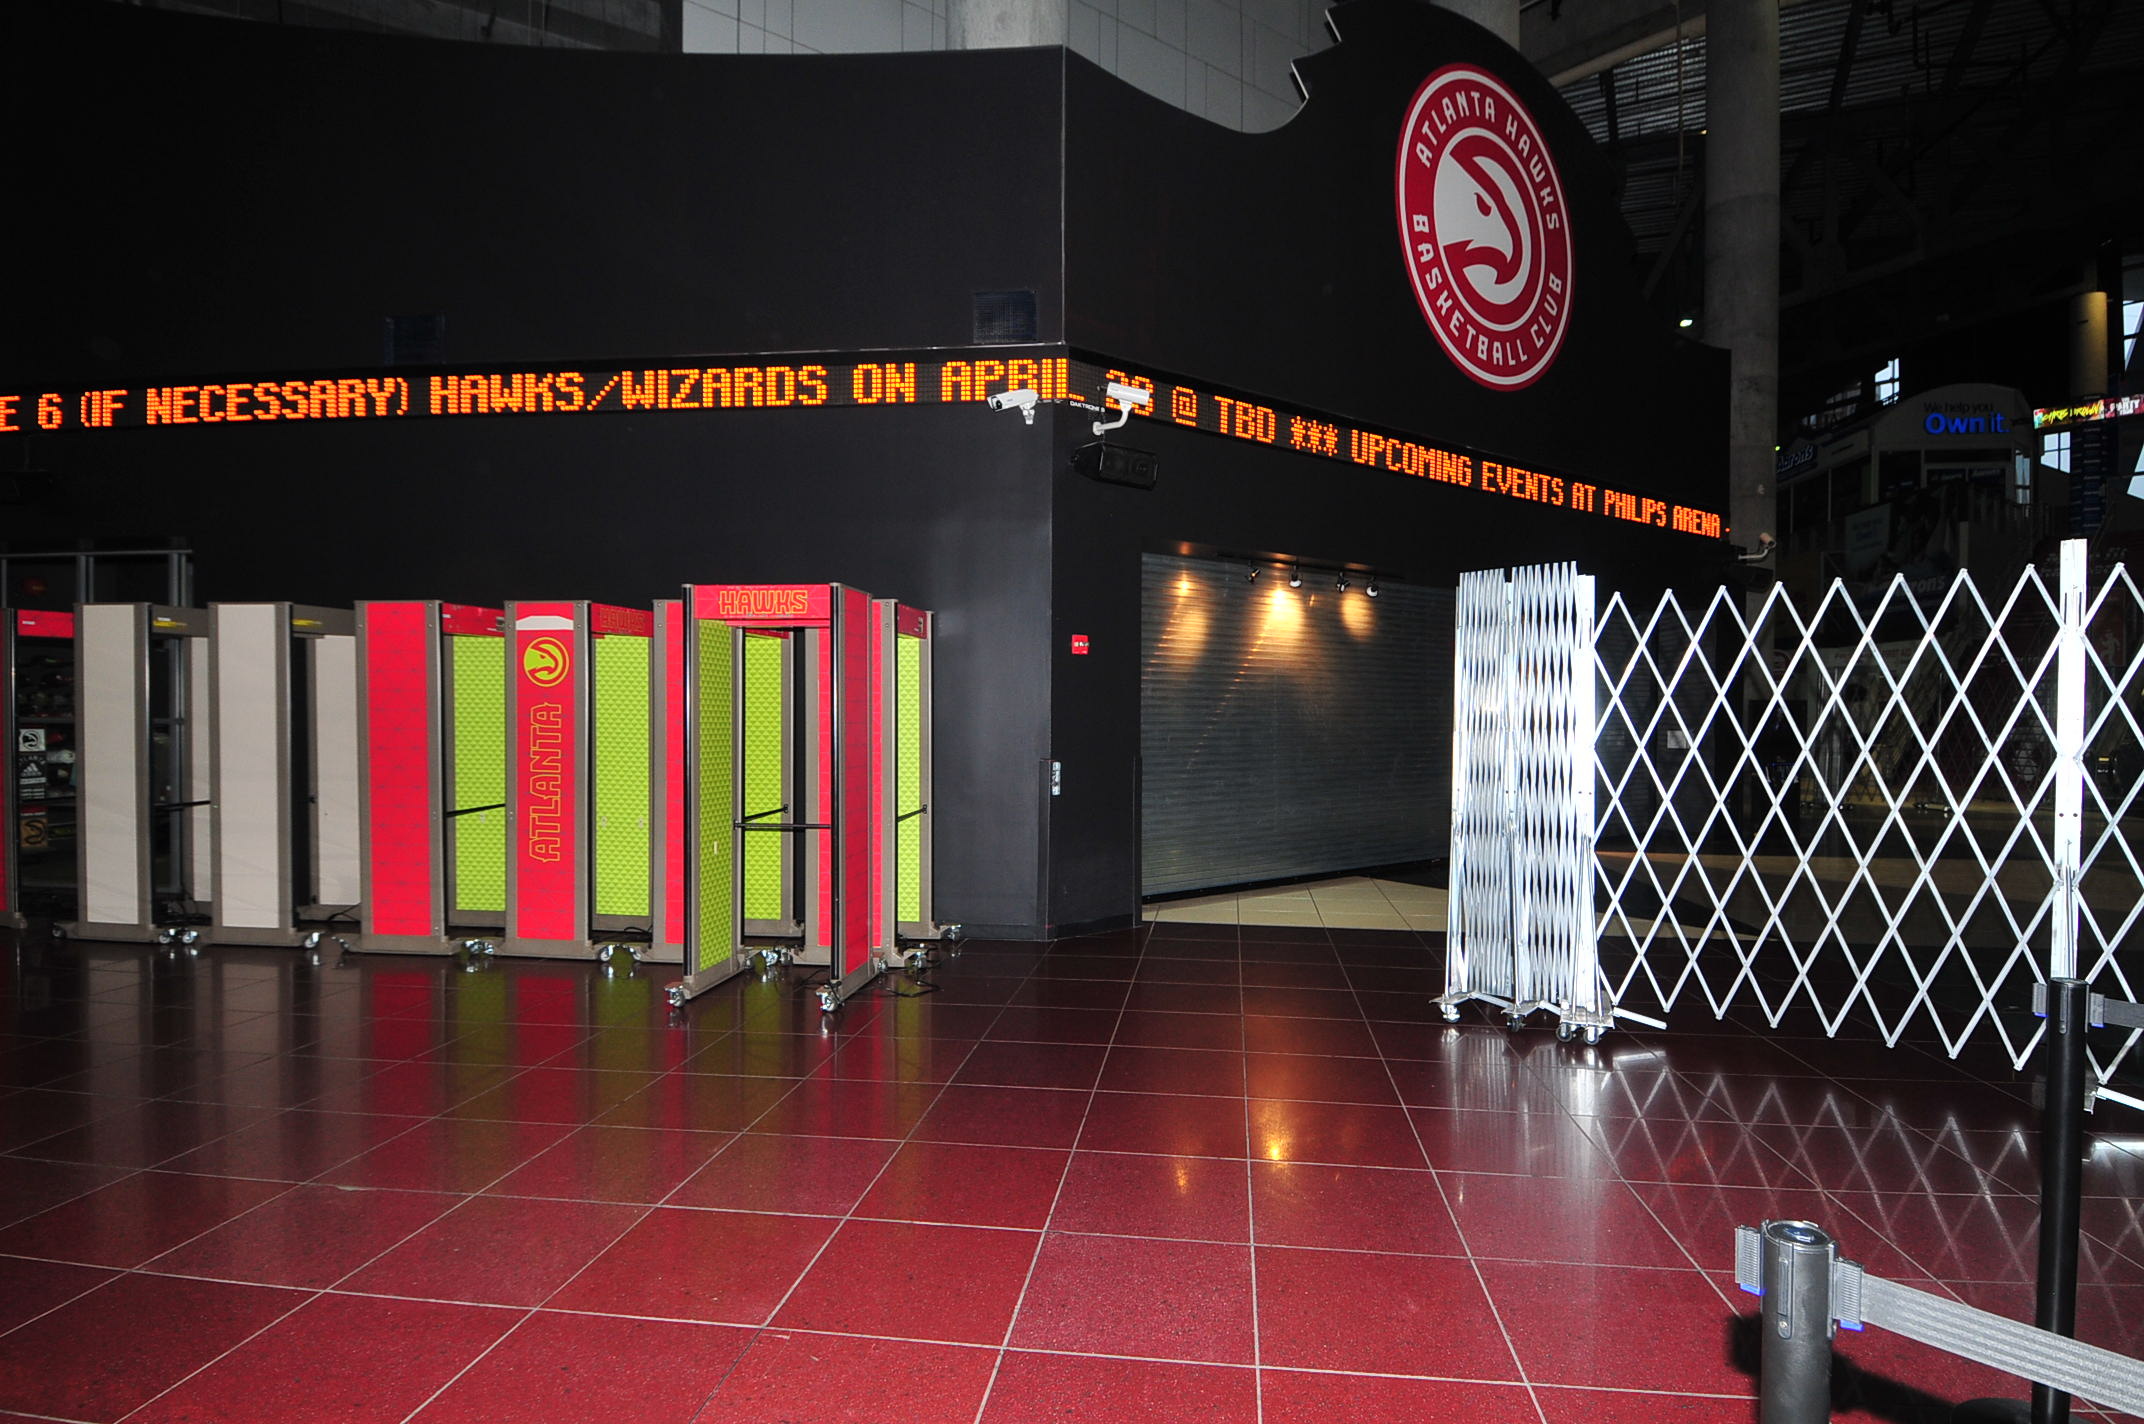 Recreation and Stadium Construction Atlanta Hawks